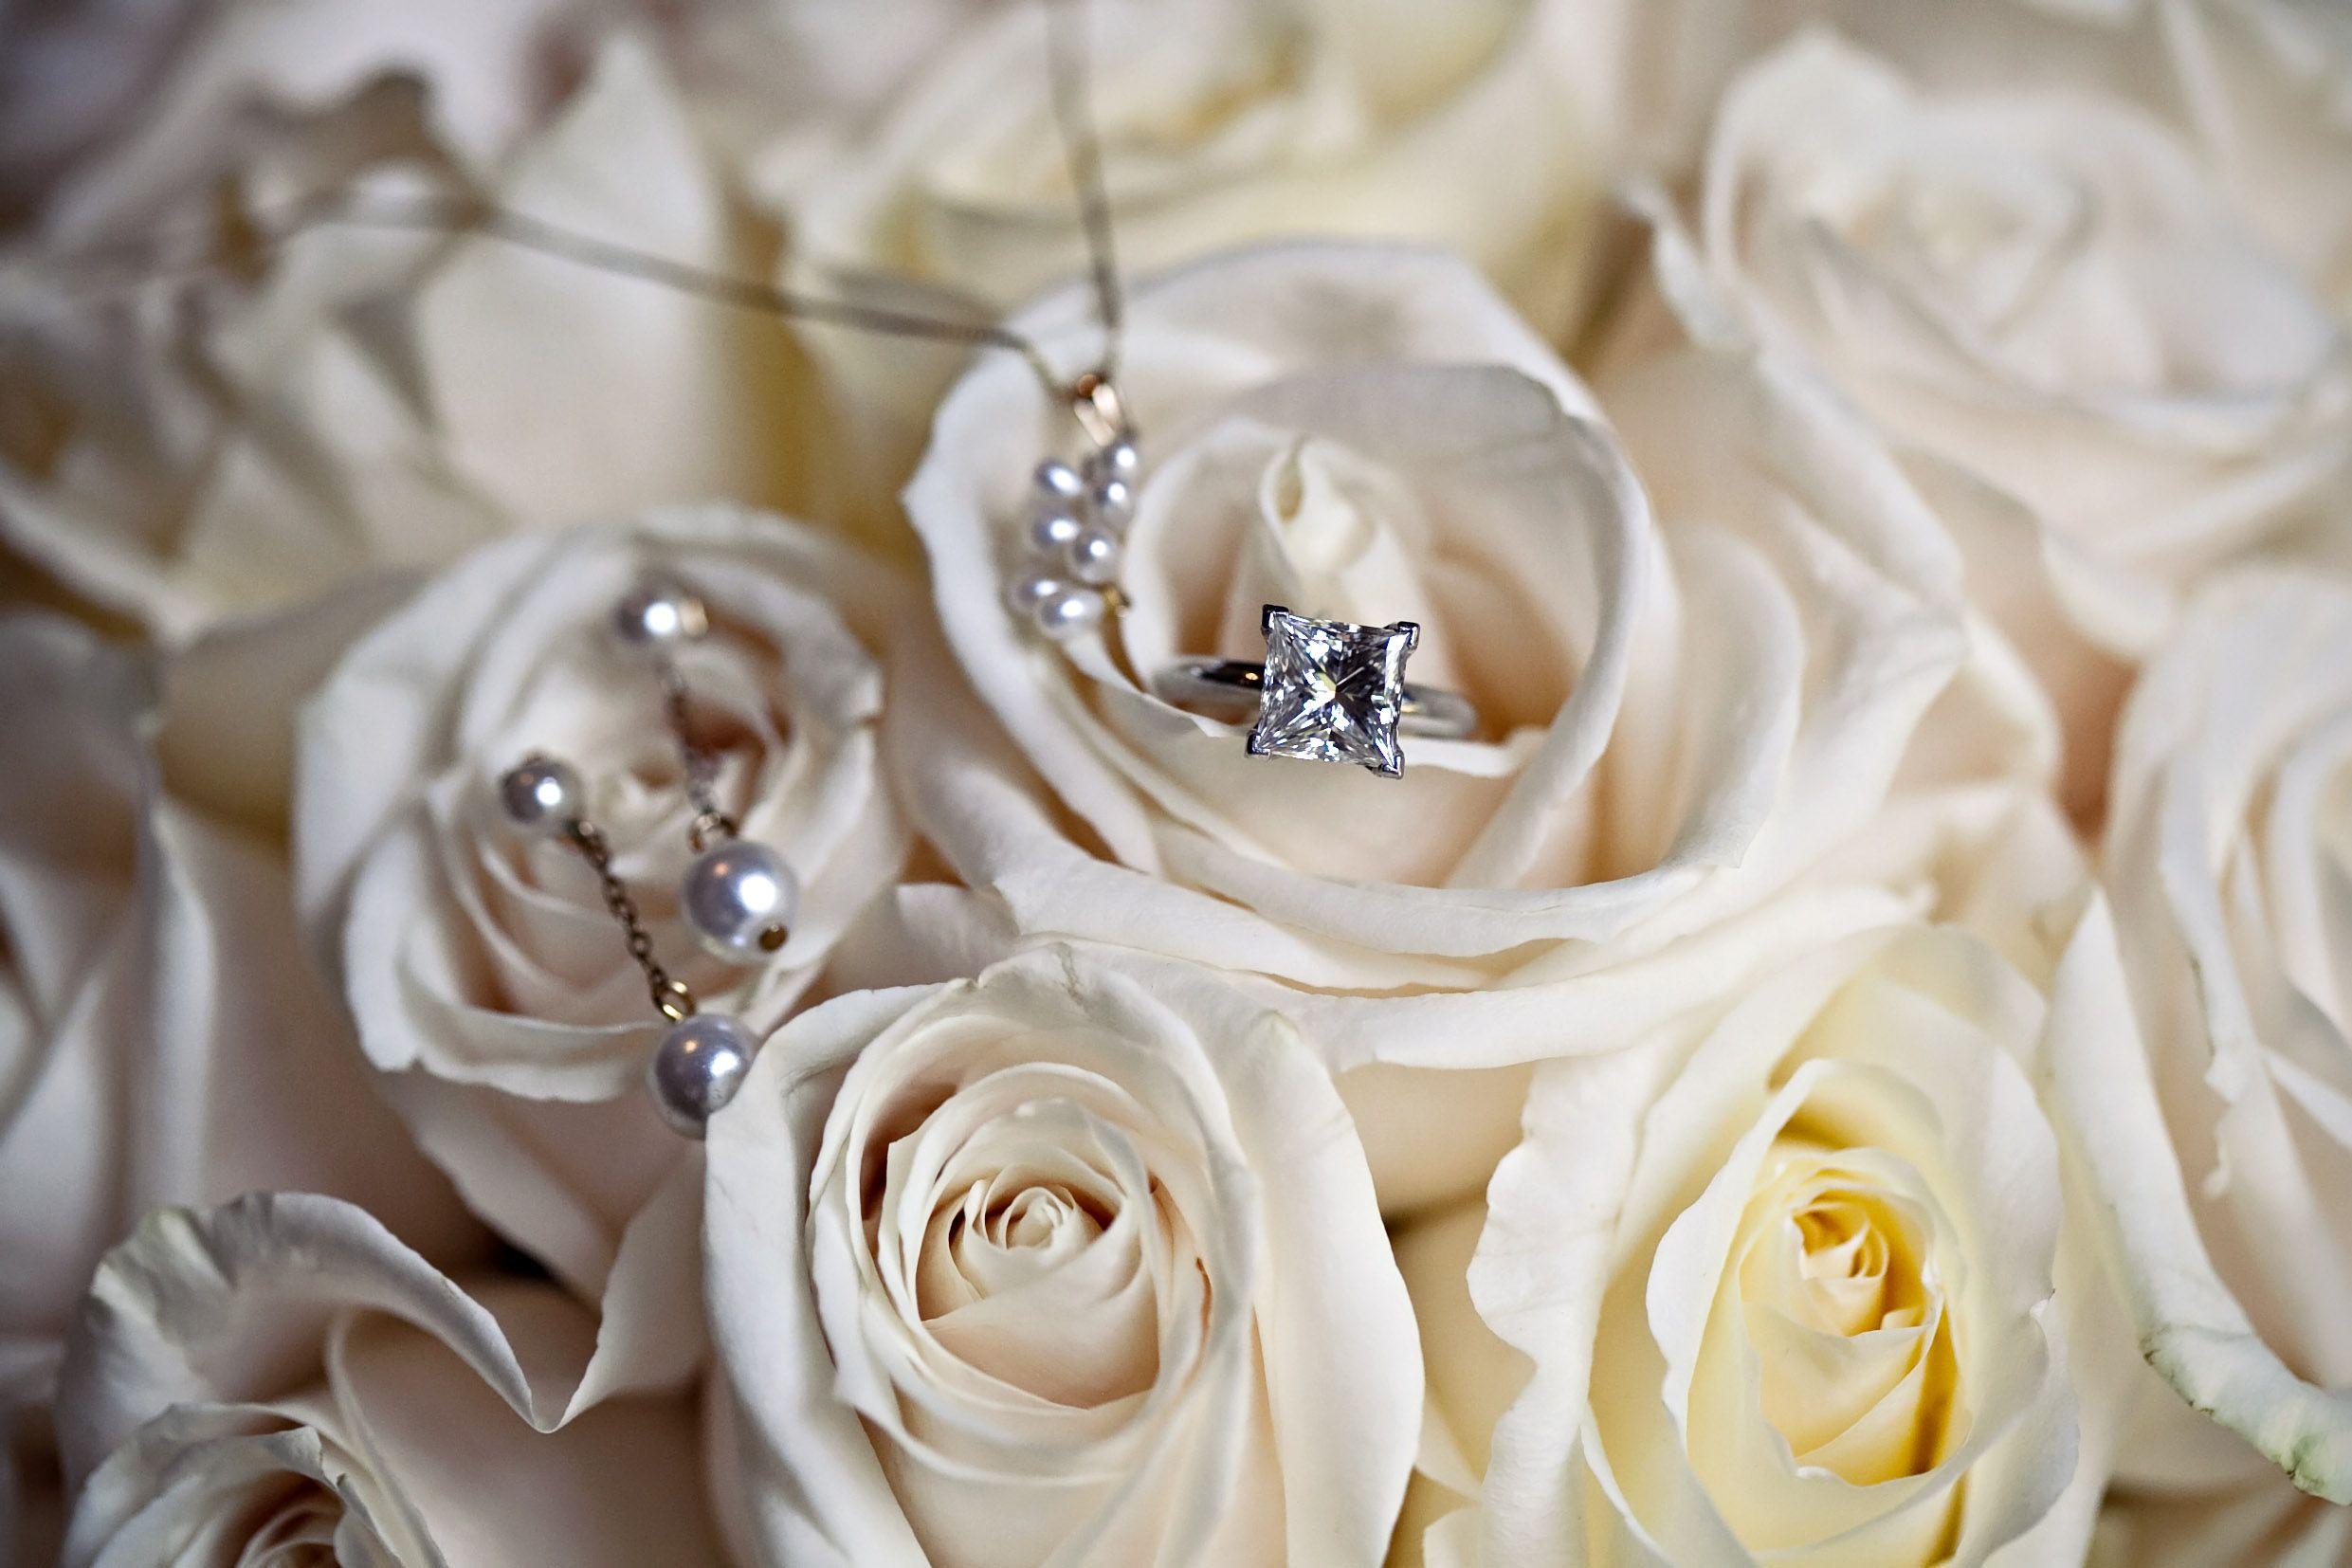 Wedding rings on white roses, simply elegant!